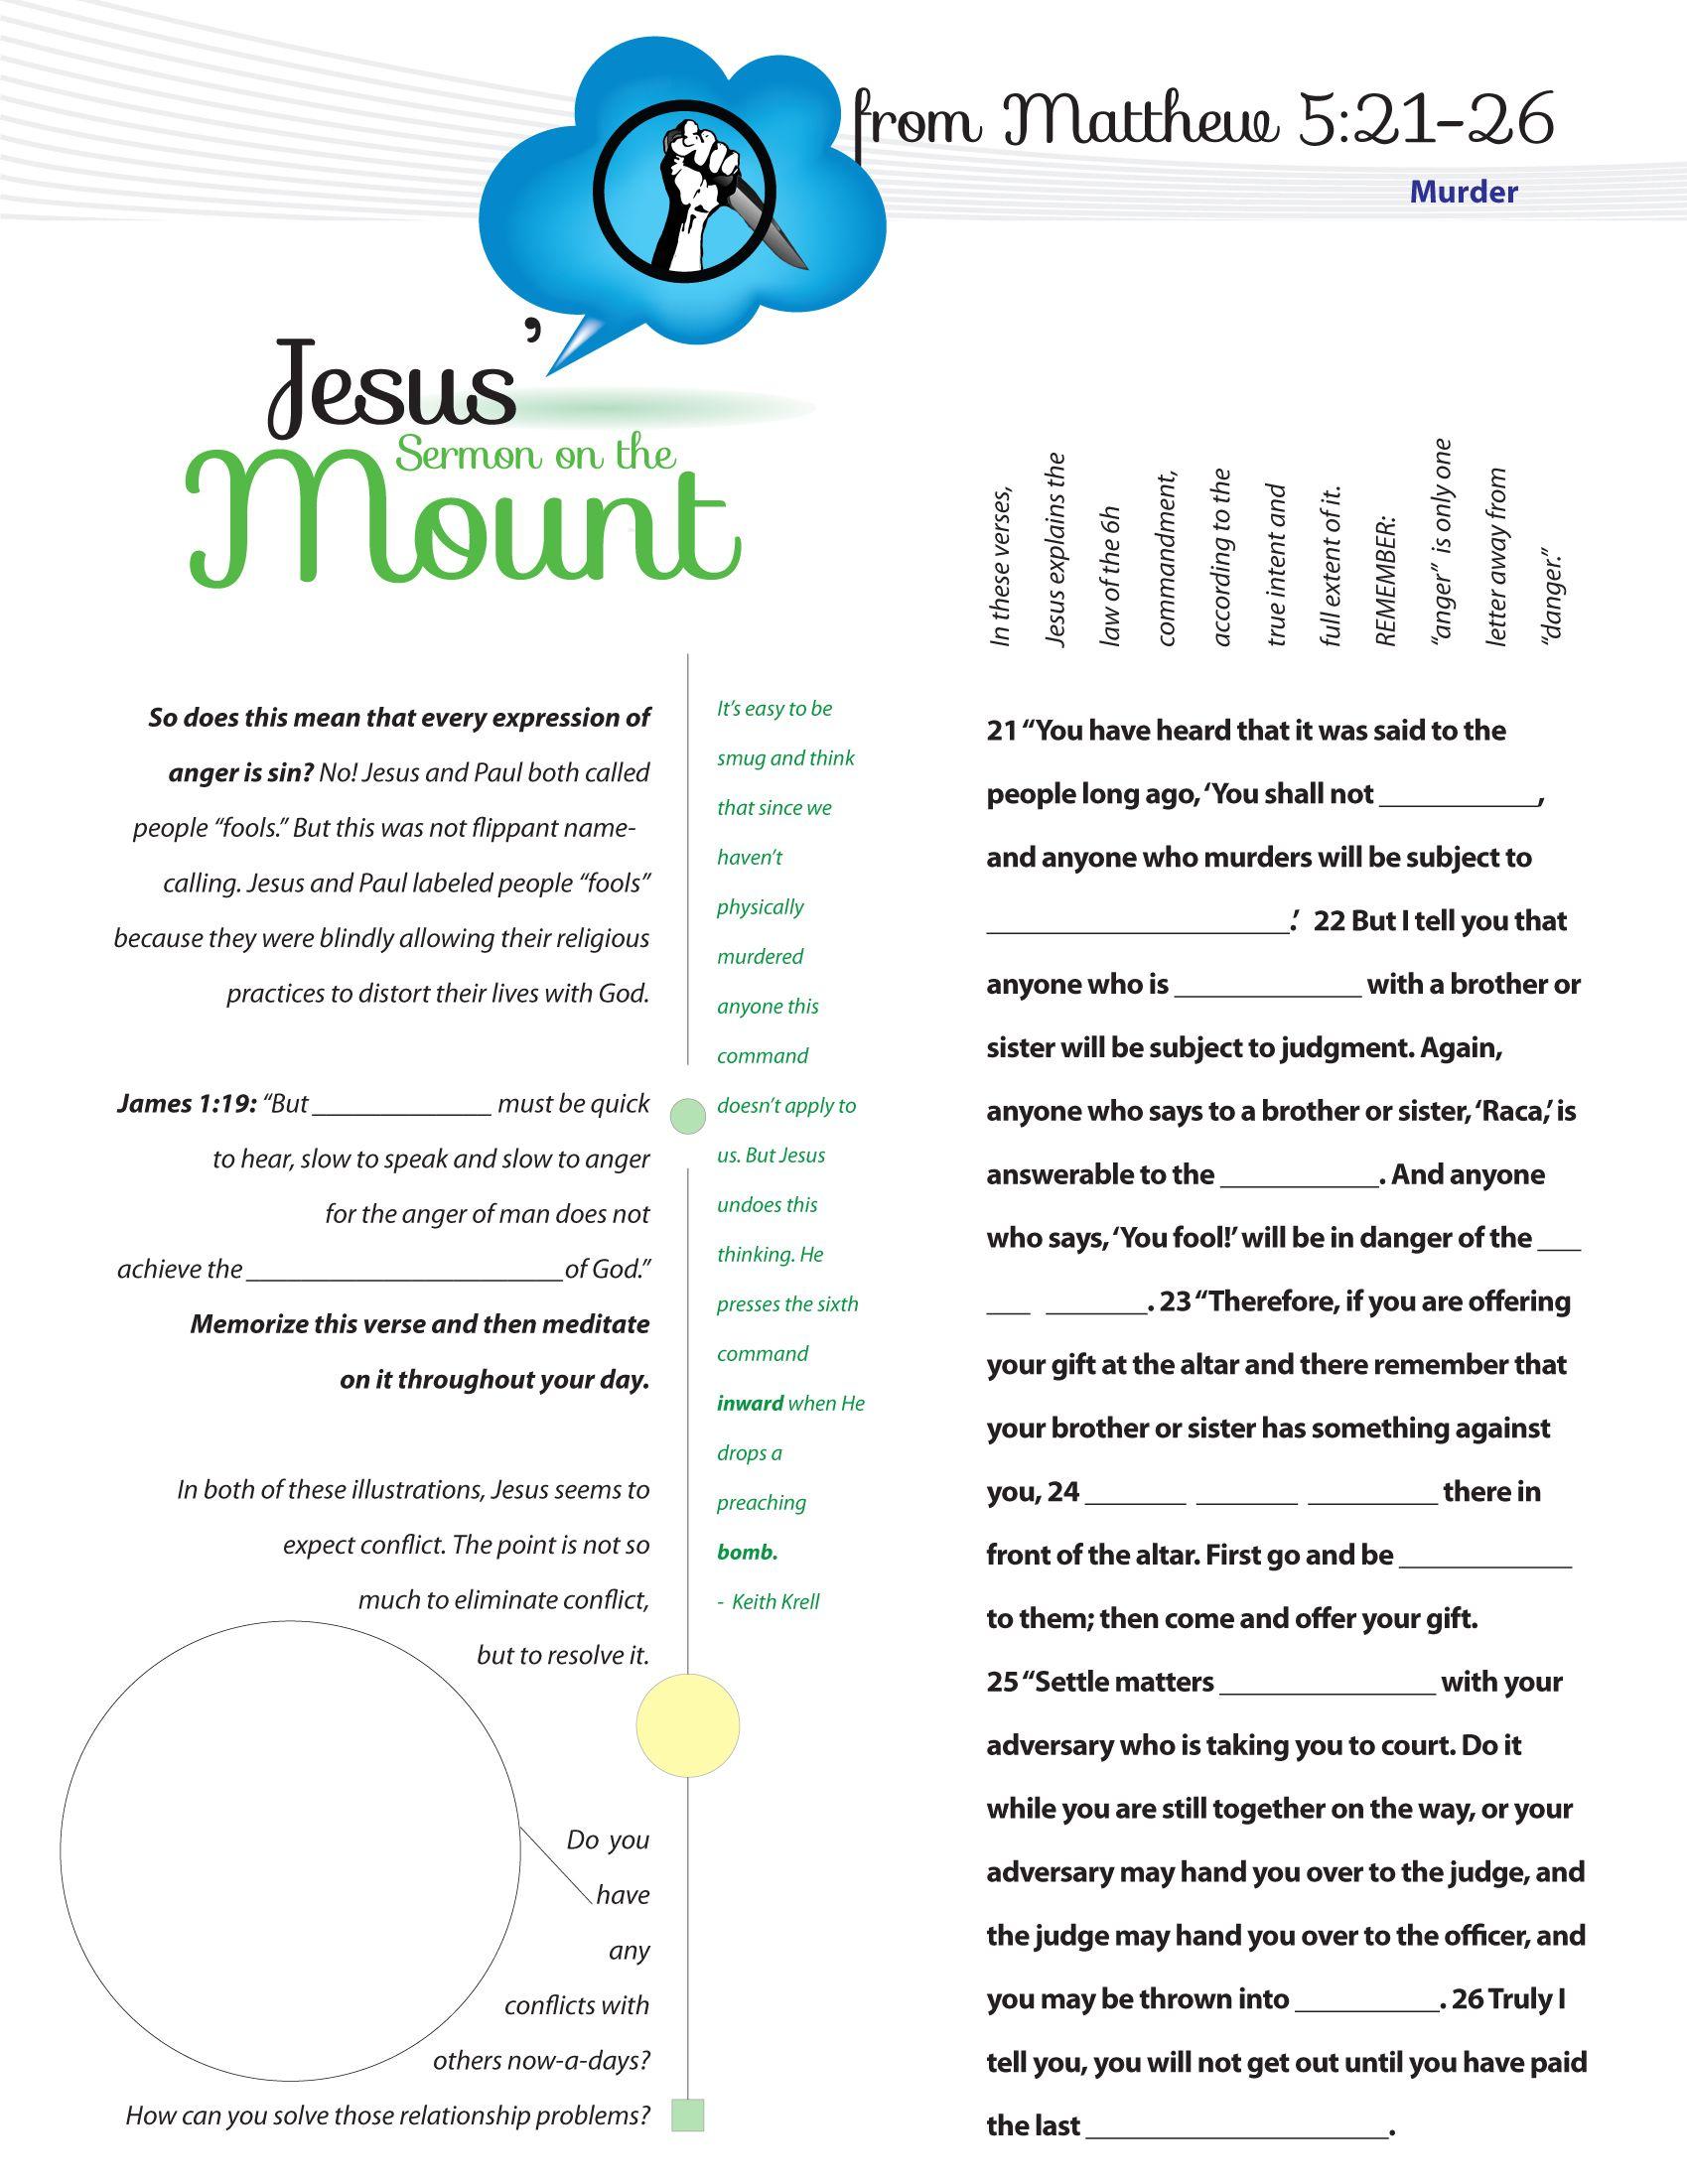 Worksheet To Teach Jesus Sermon On The Mount From Matthew